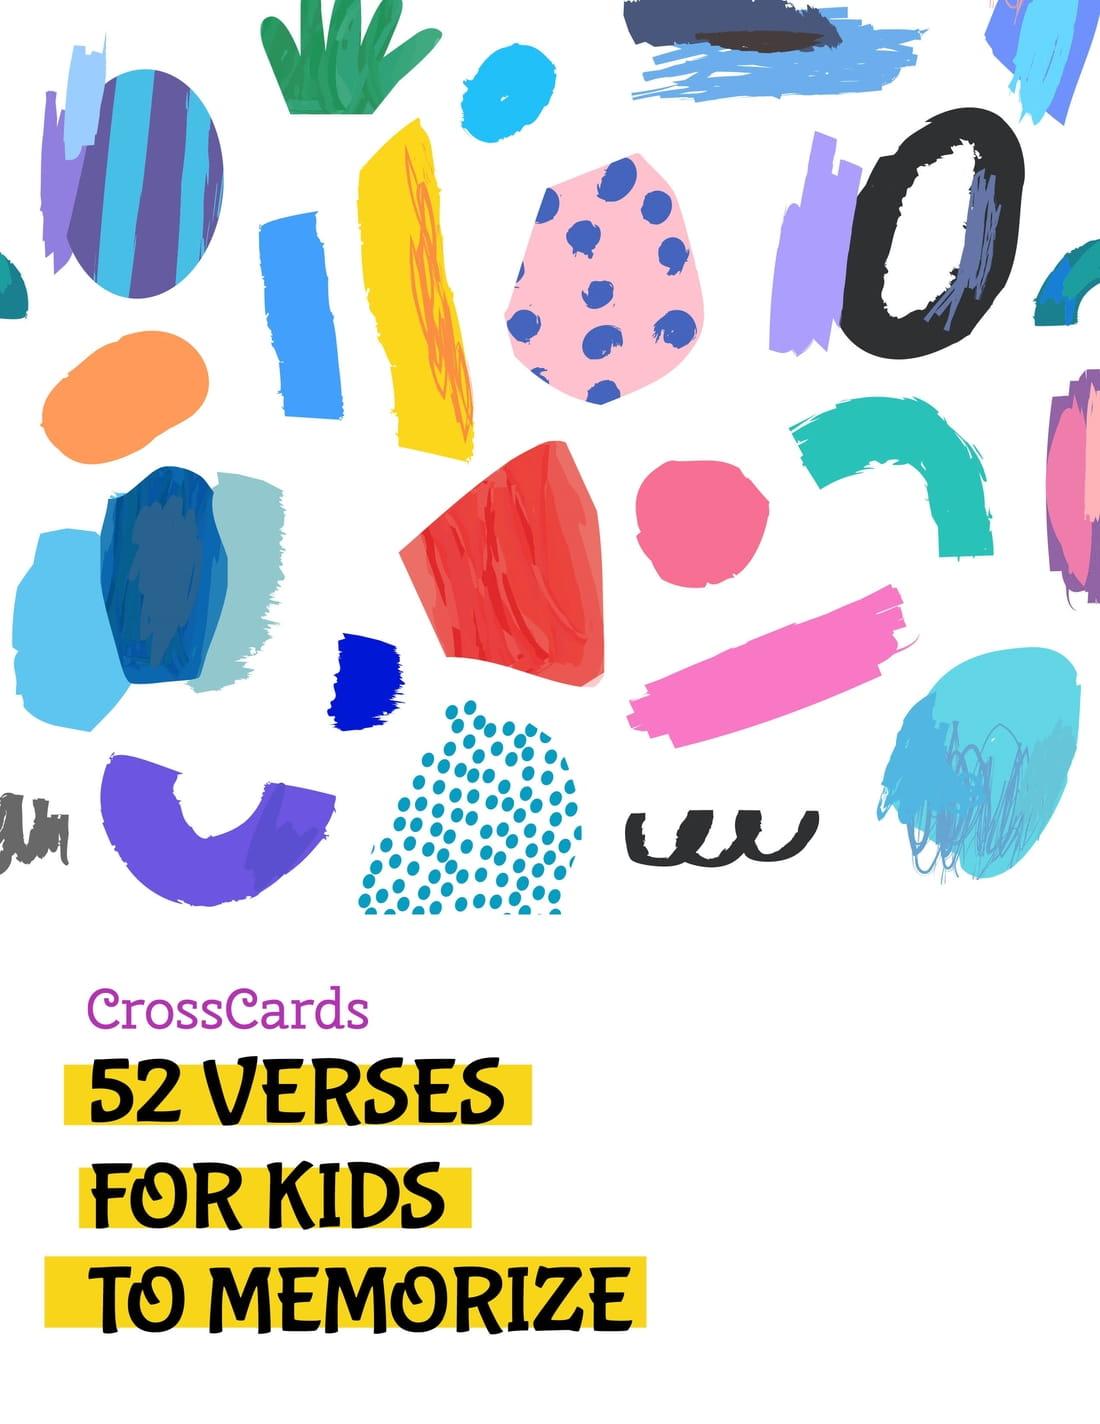 52 Verses for Kids to Memorize